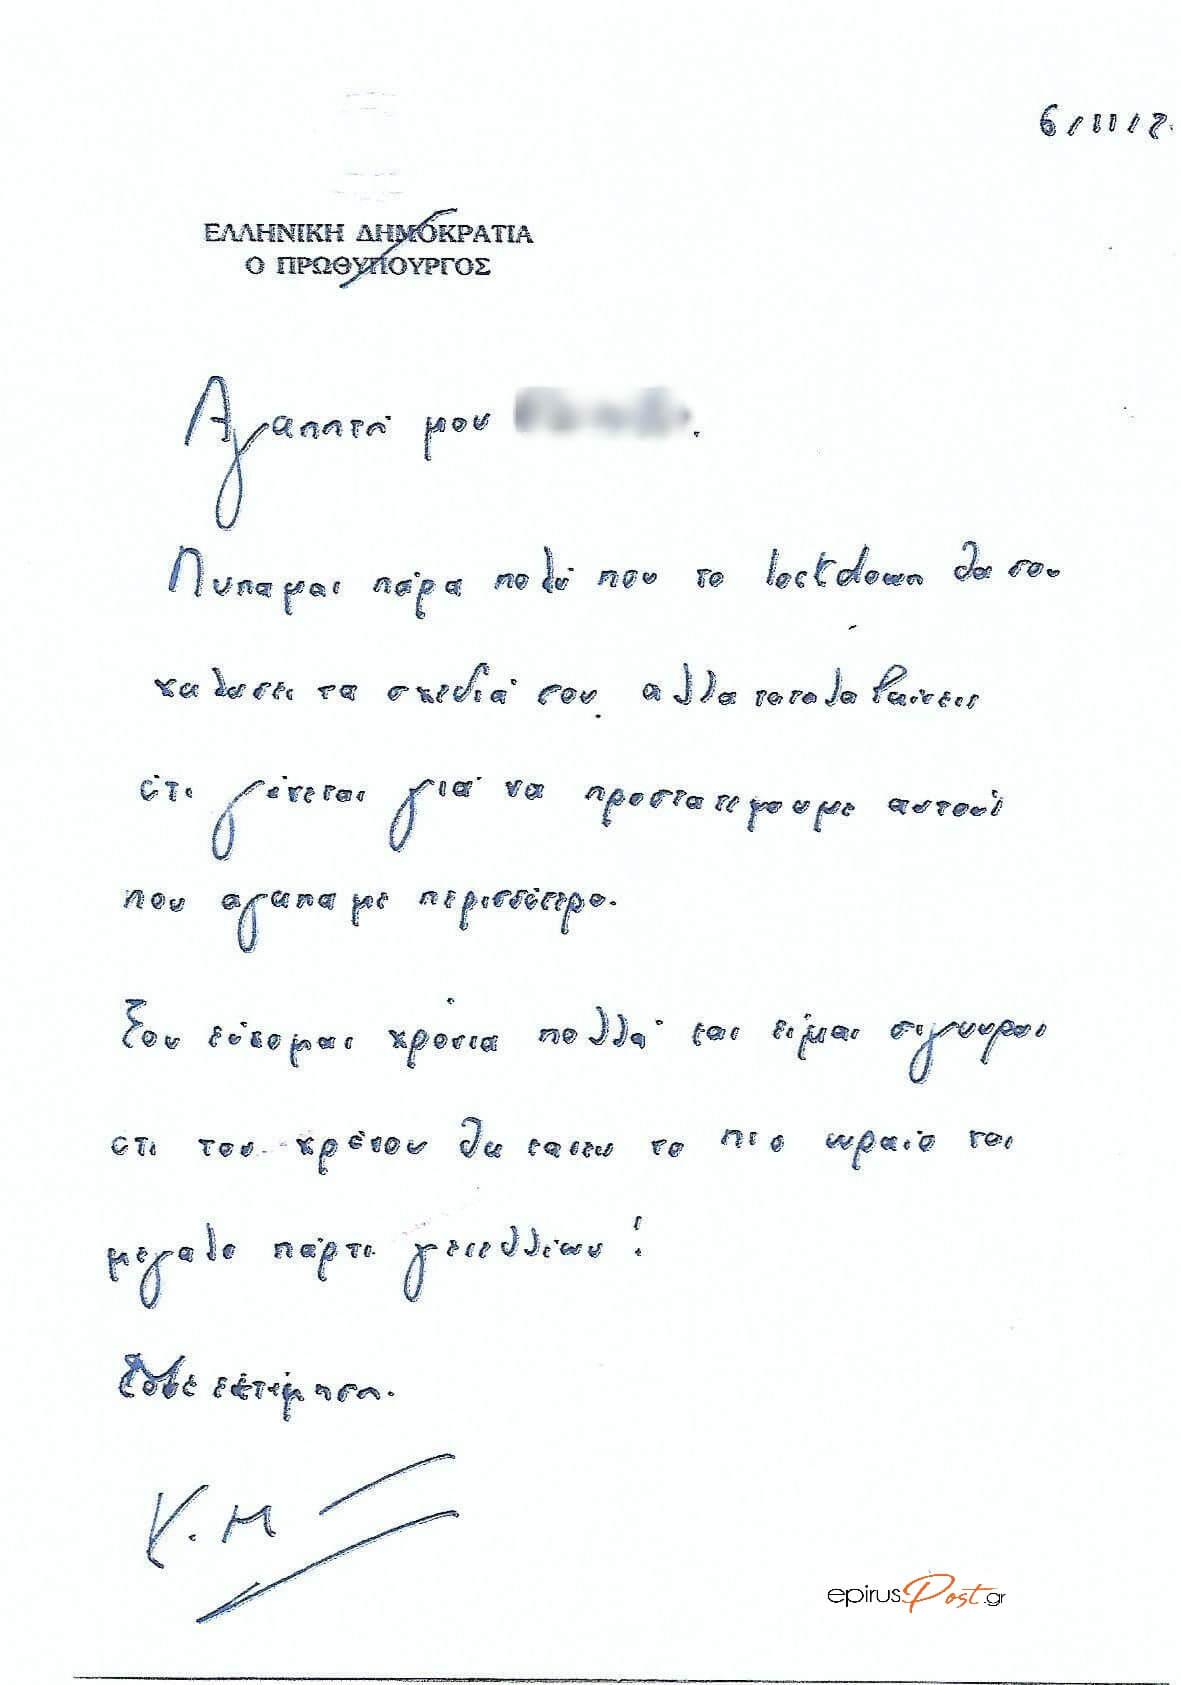 EpirusPost • Ειδήσεις, Ιωάννινα, Άρτα, Πρέβεζα, Θεσπρωτία • epistoli2